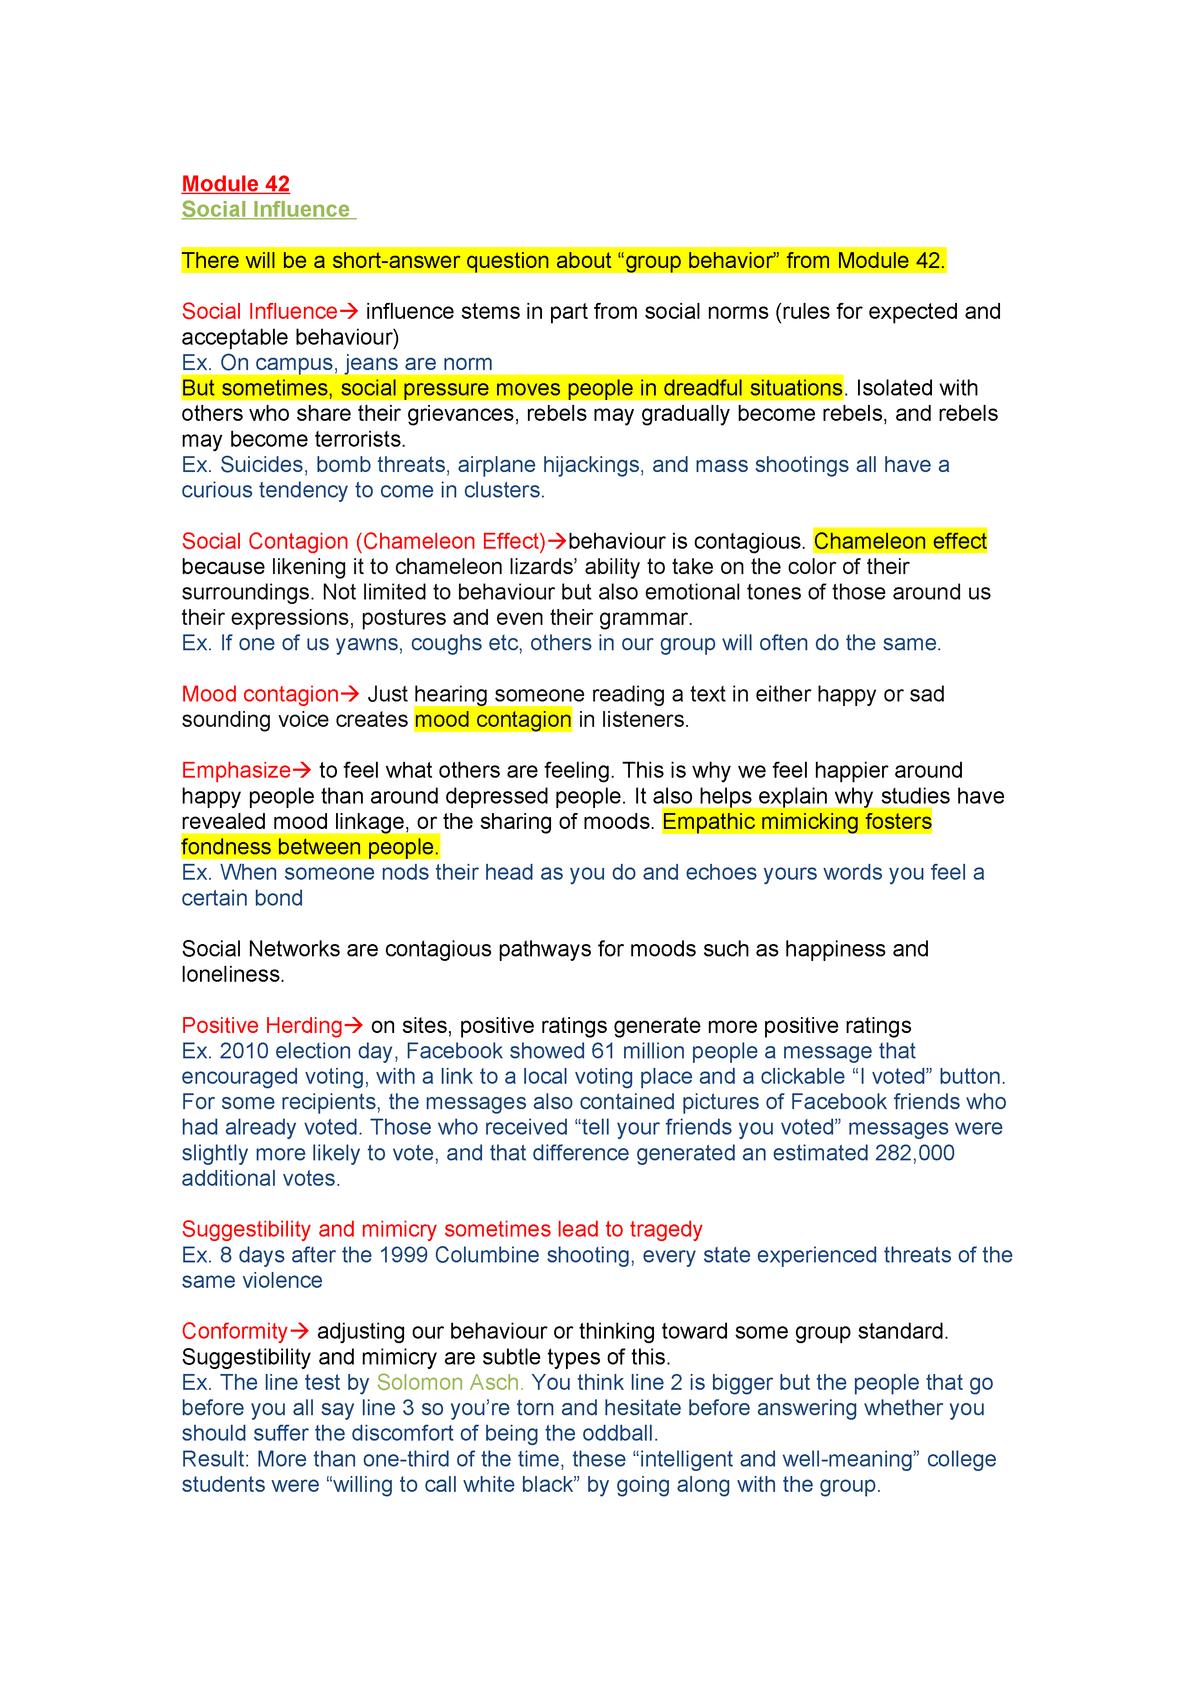 Module 42 - PSYC 1010: Introduction to Psychology - StuDocu